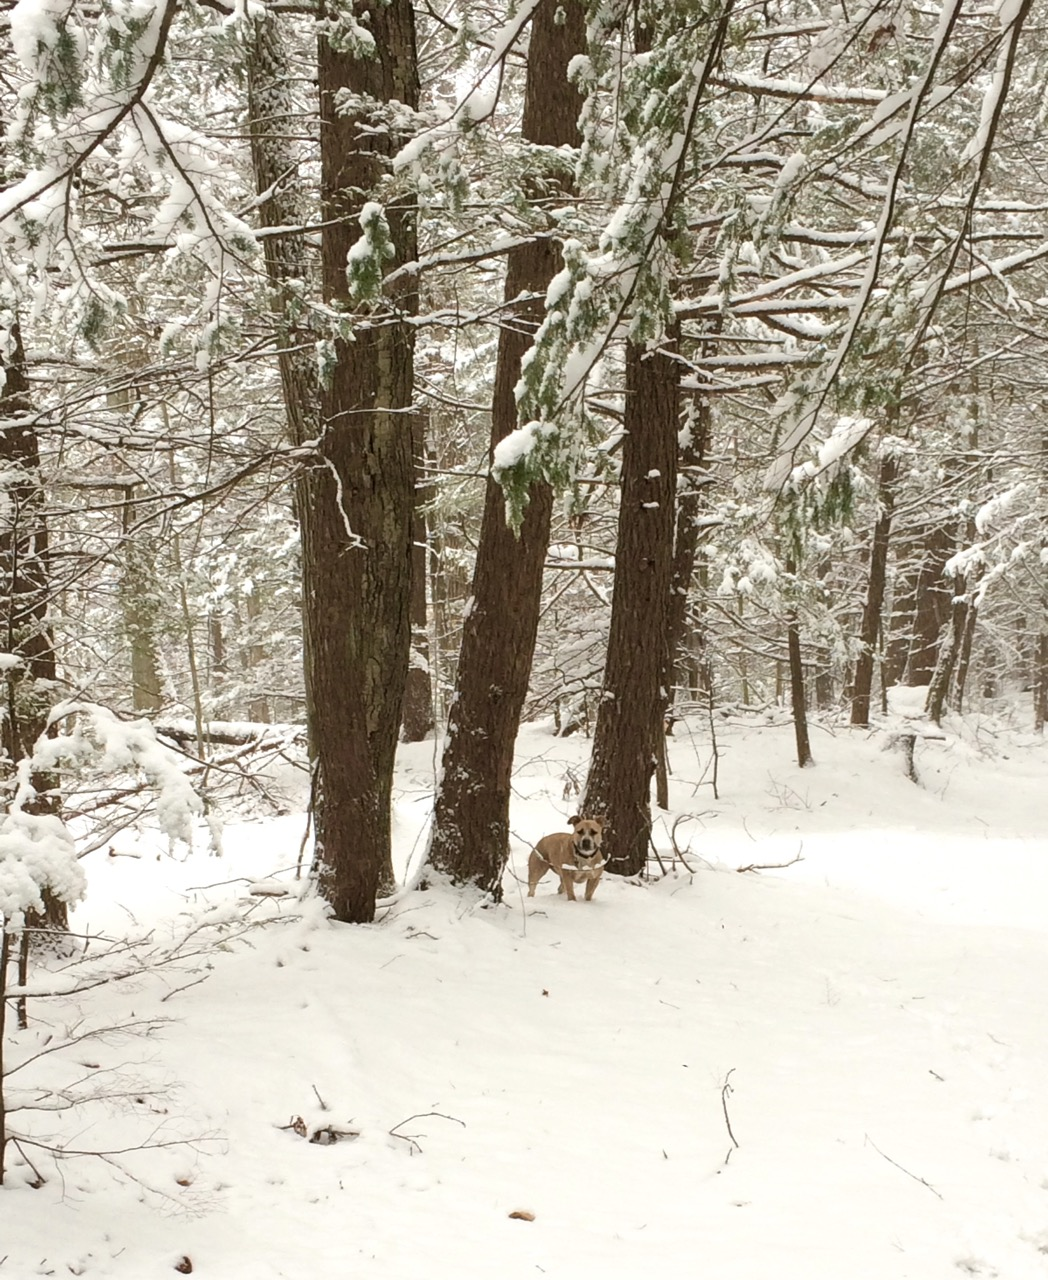 Winter Wonderland pre-porcupine